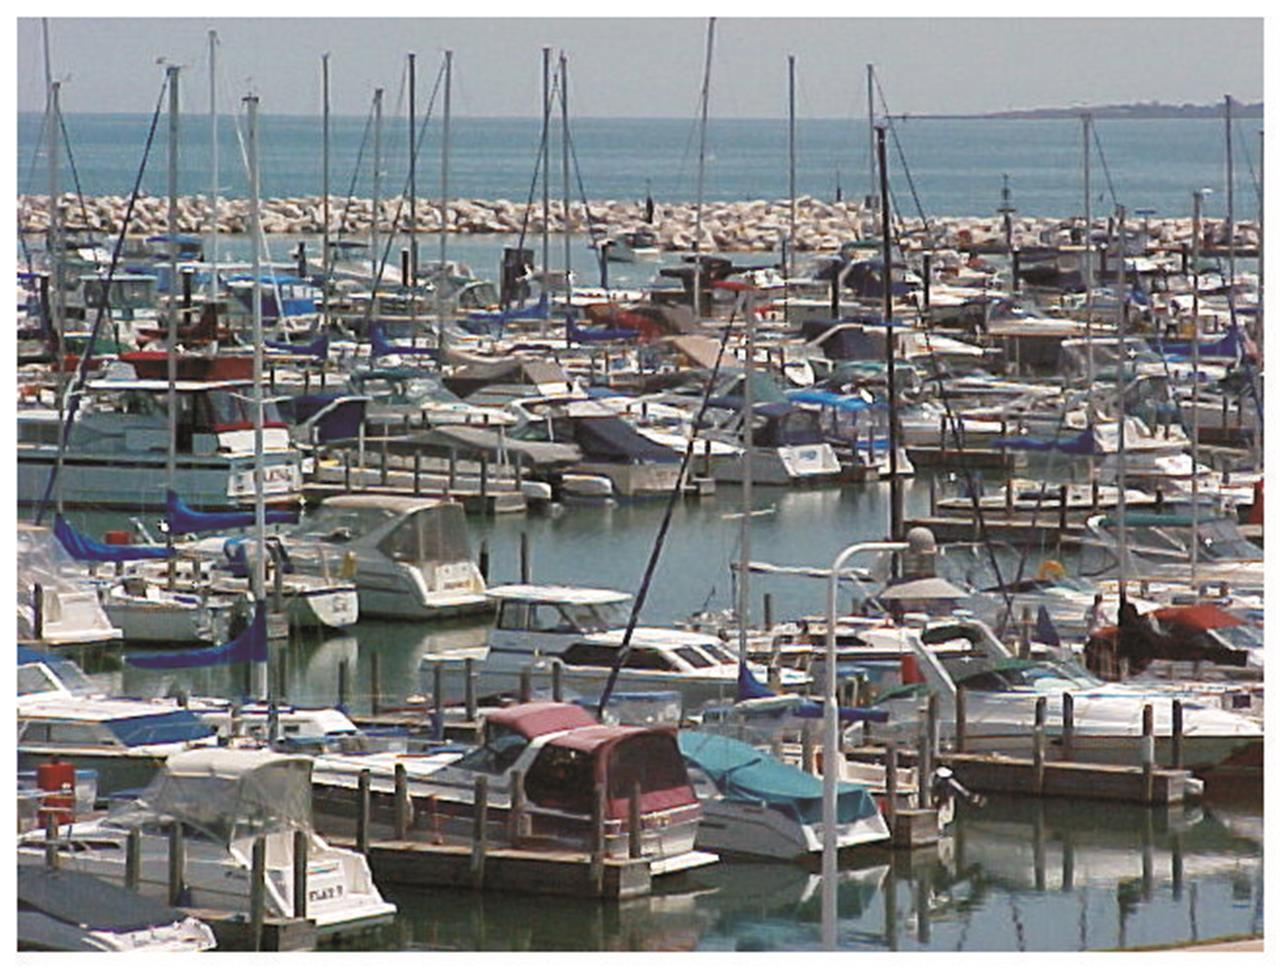 Pastrick Marina on Lake Michigan along the shoreline of East Chicago, Indiana.